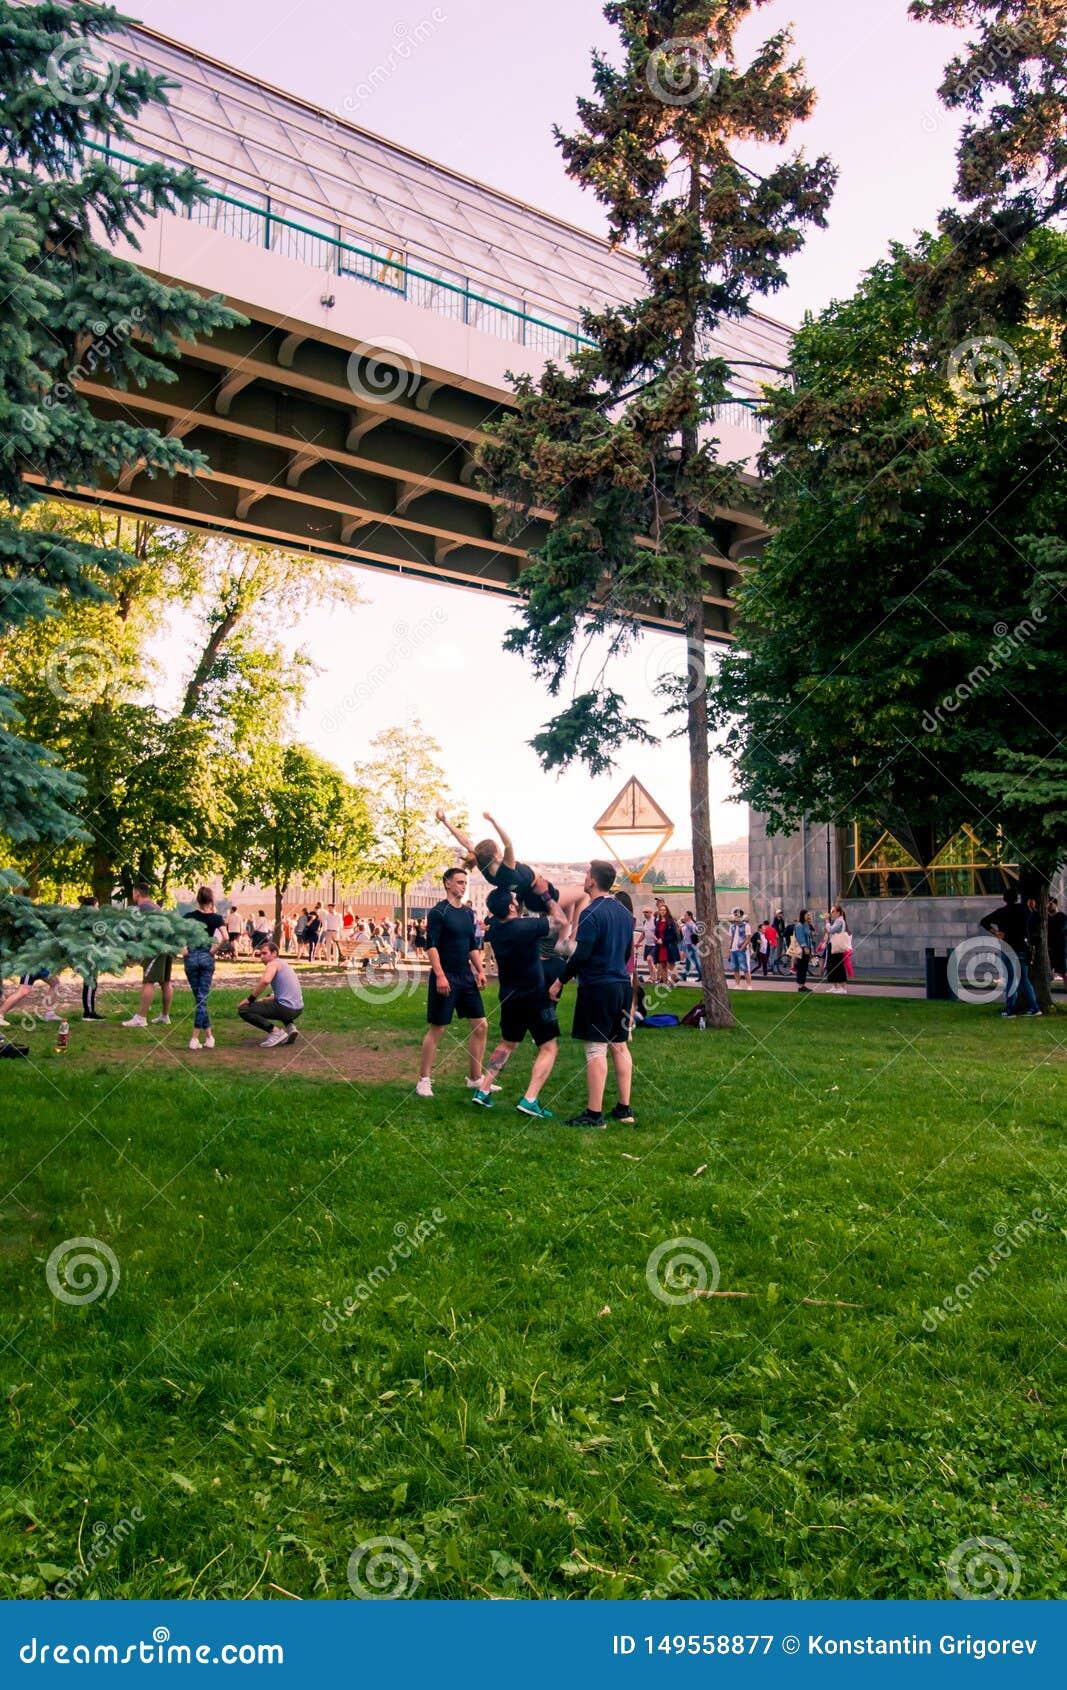 Moskwa, Russia-06 01 2019: cheerleaders trenuje w parku na trawie